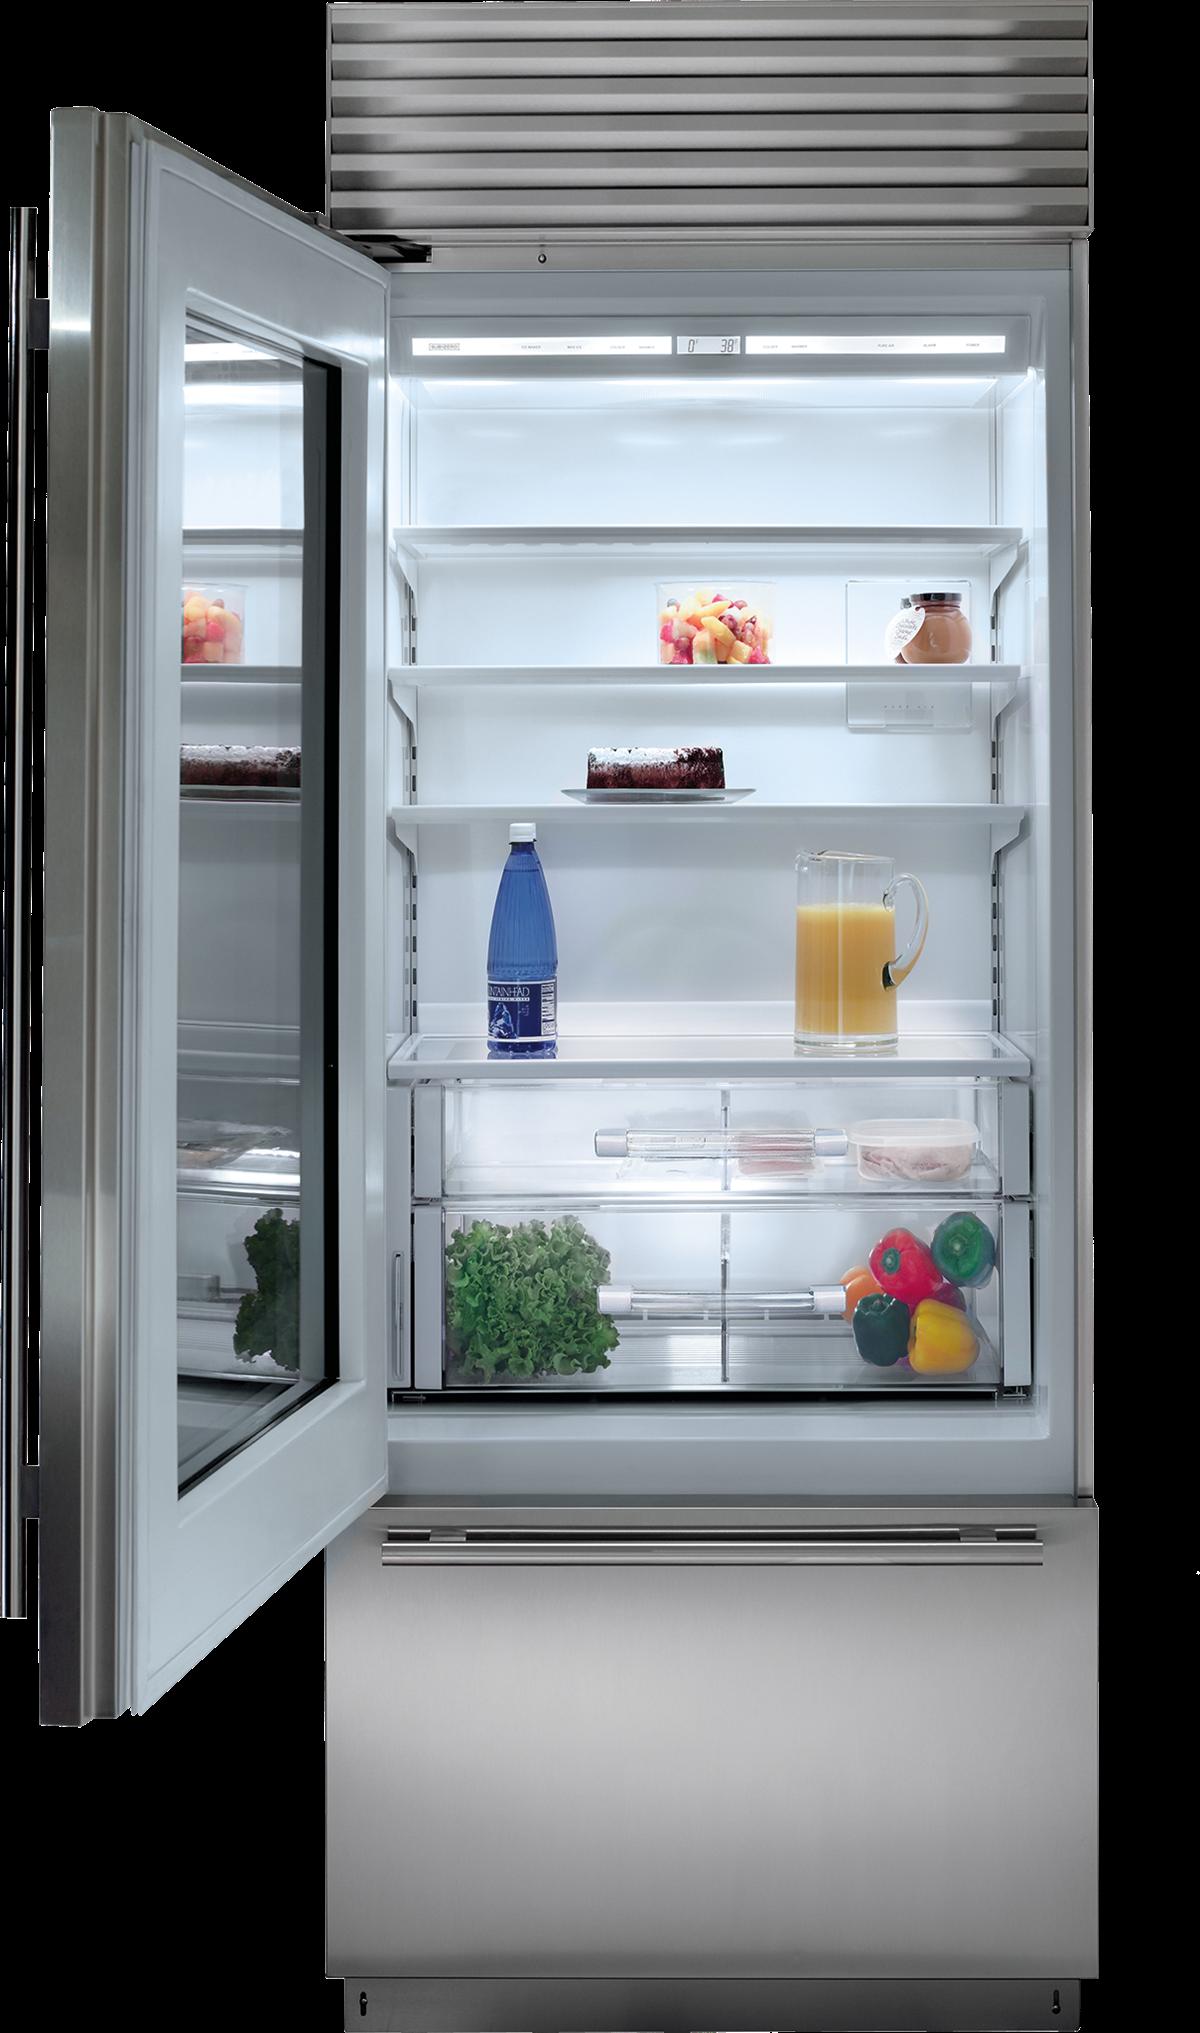 Sub zero 30 classic over and under refrigerator freezer - Glass door refrigerator freezer ...